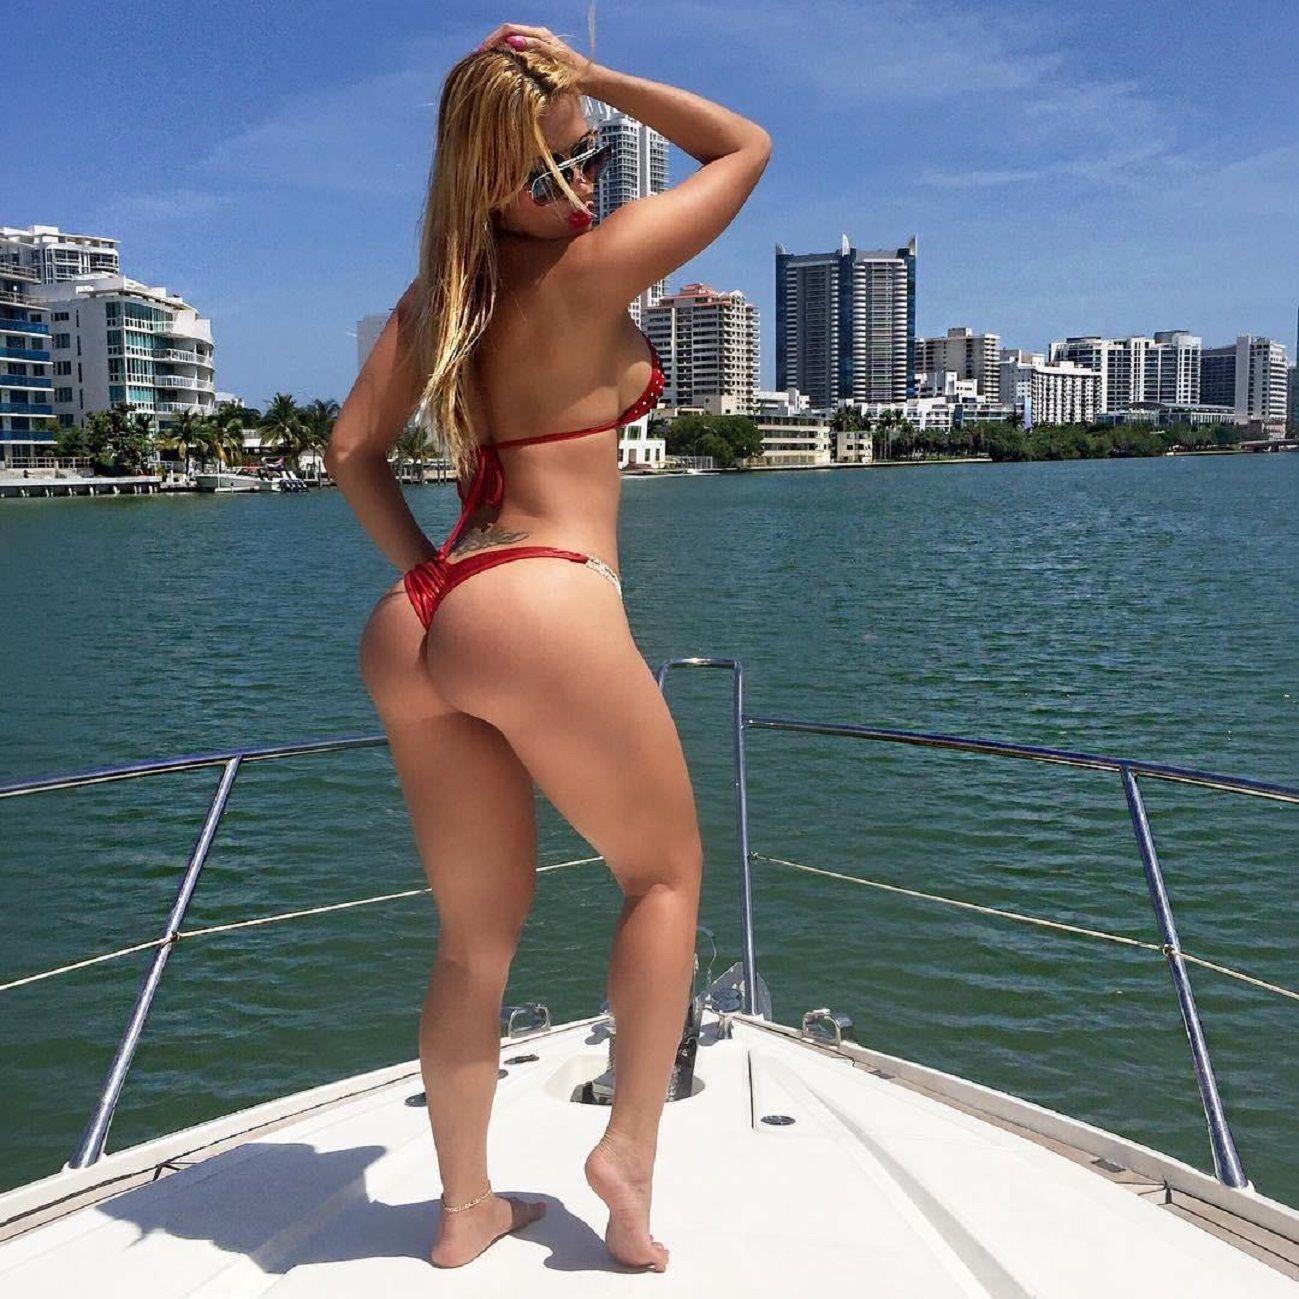 dayami padron big booty & big boobs | tangas | pinterest | boobs